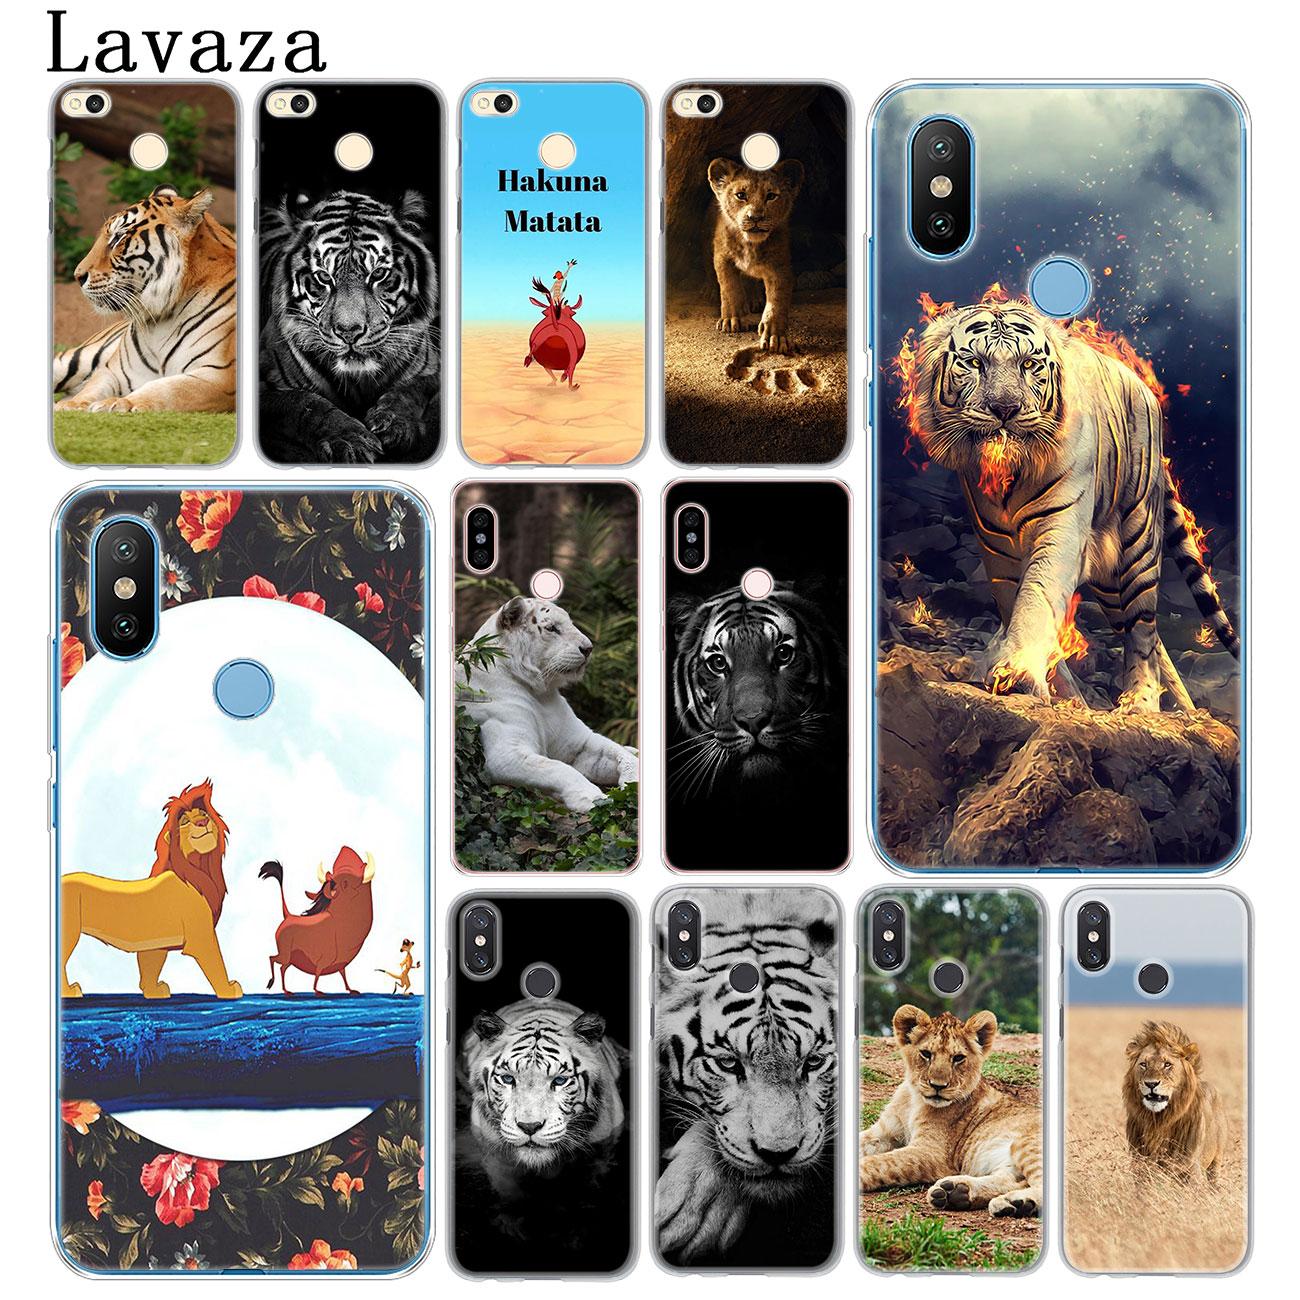 Lavaza El Rey León Tigre cubierta de la caja del teléfono para la Xiaomi mi 10 9 9T CC9 CC9E A3 Pro 8 SE A2 Lite A1 6 teléfono móvil f1 mi 10